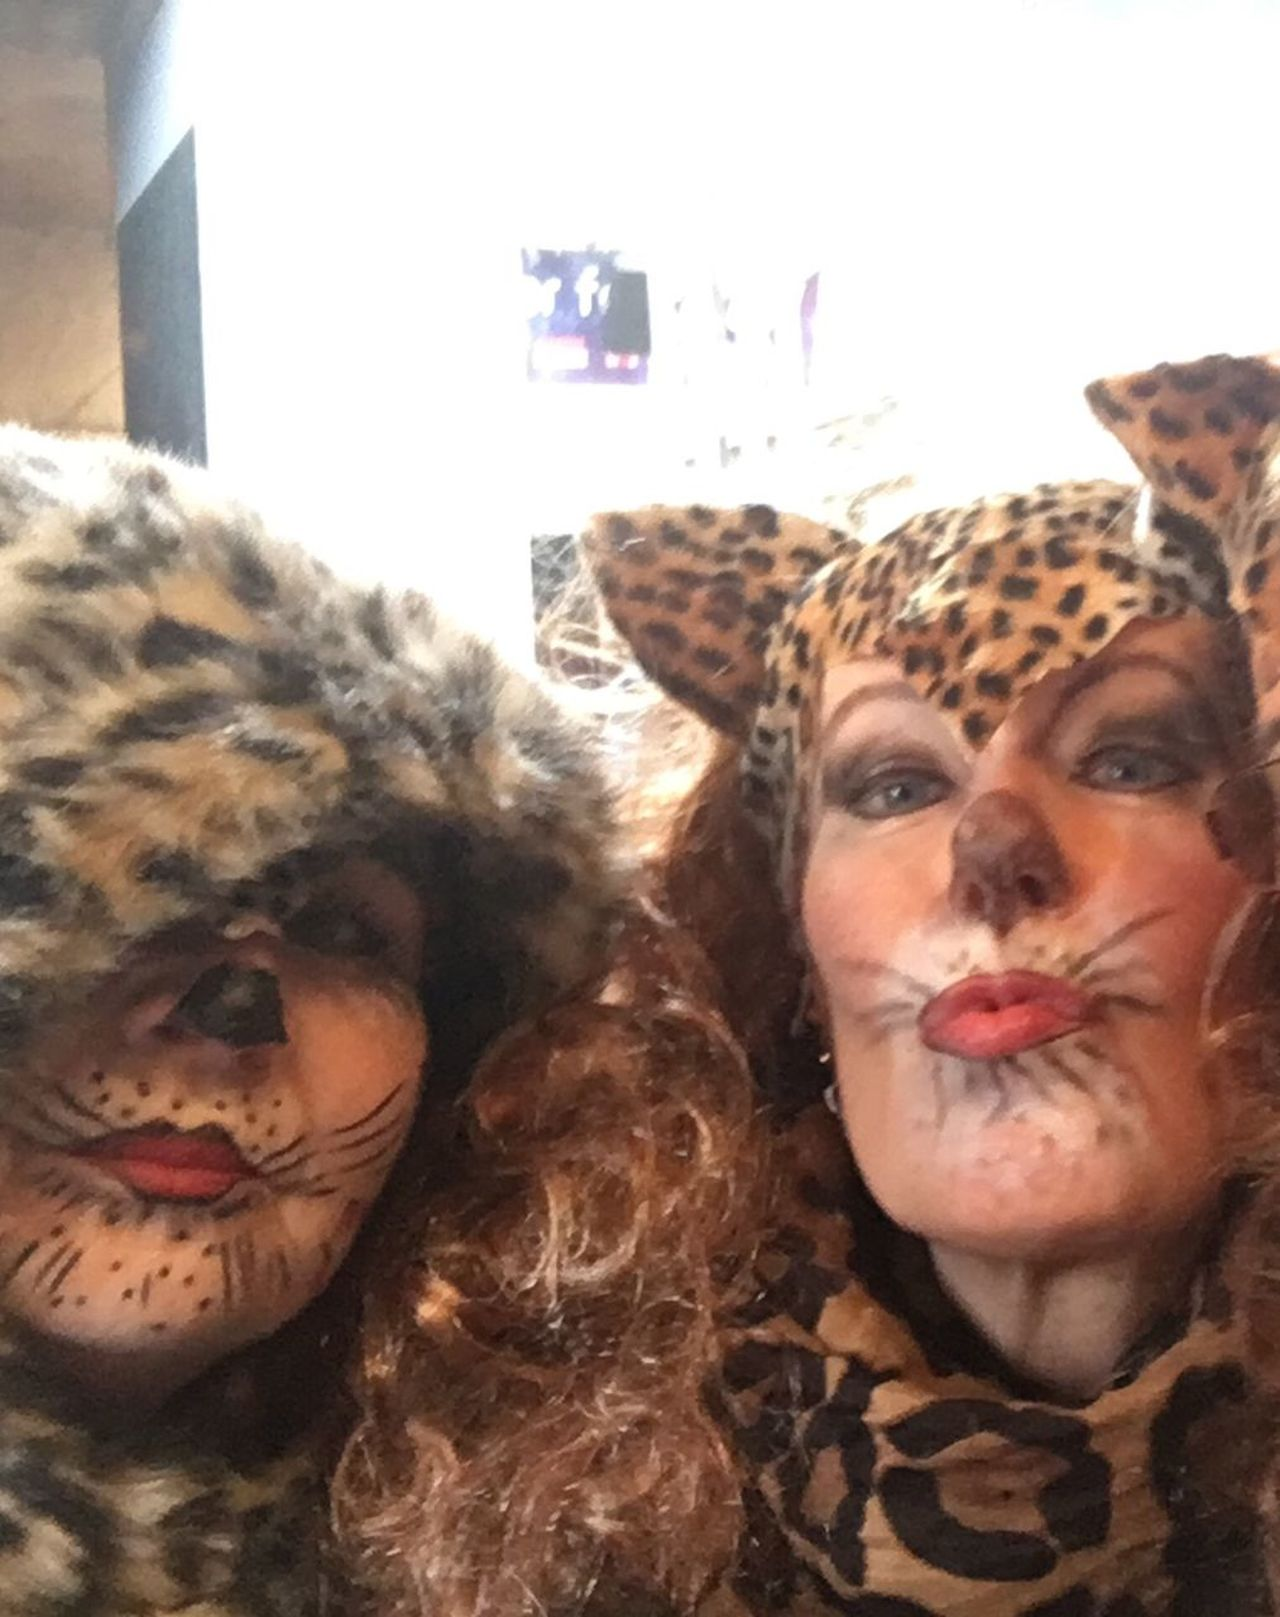 Carnival Crowds And Details Karneval 2017 Düsseldorf Verkleidung Its Me Feiern With Friends